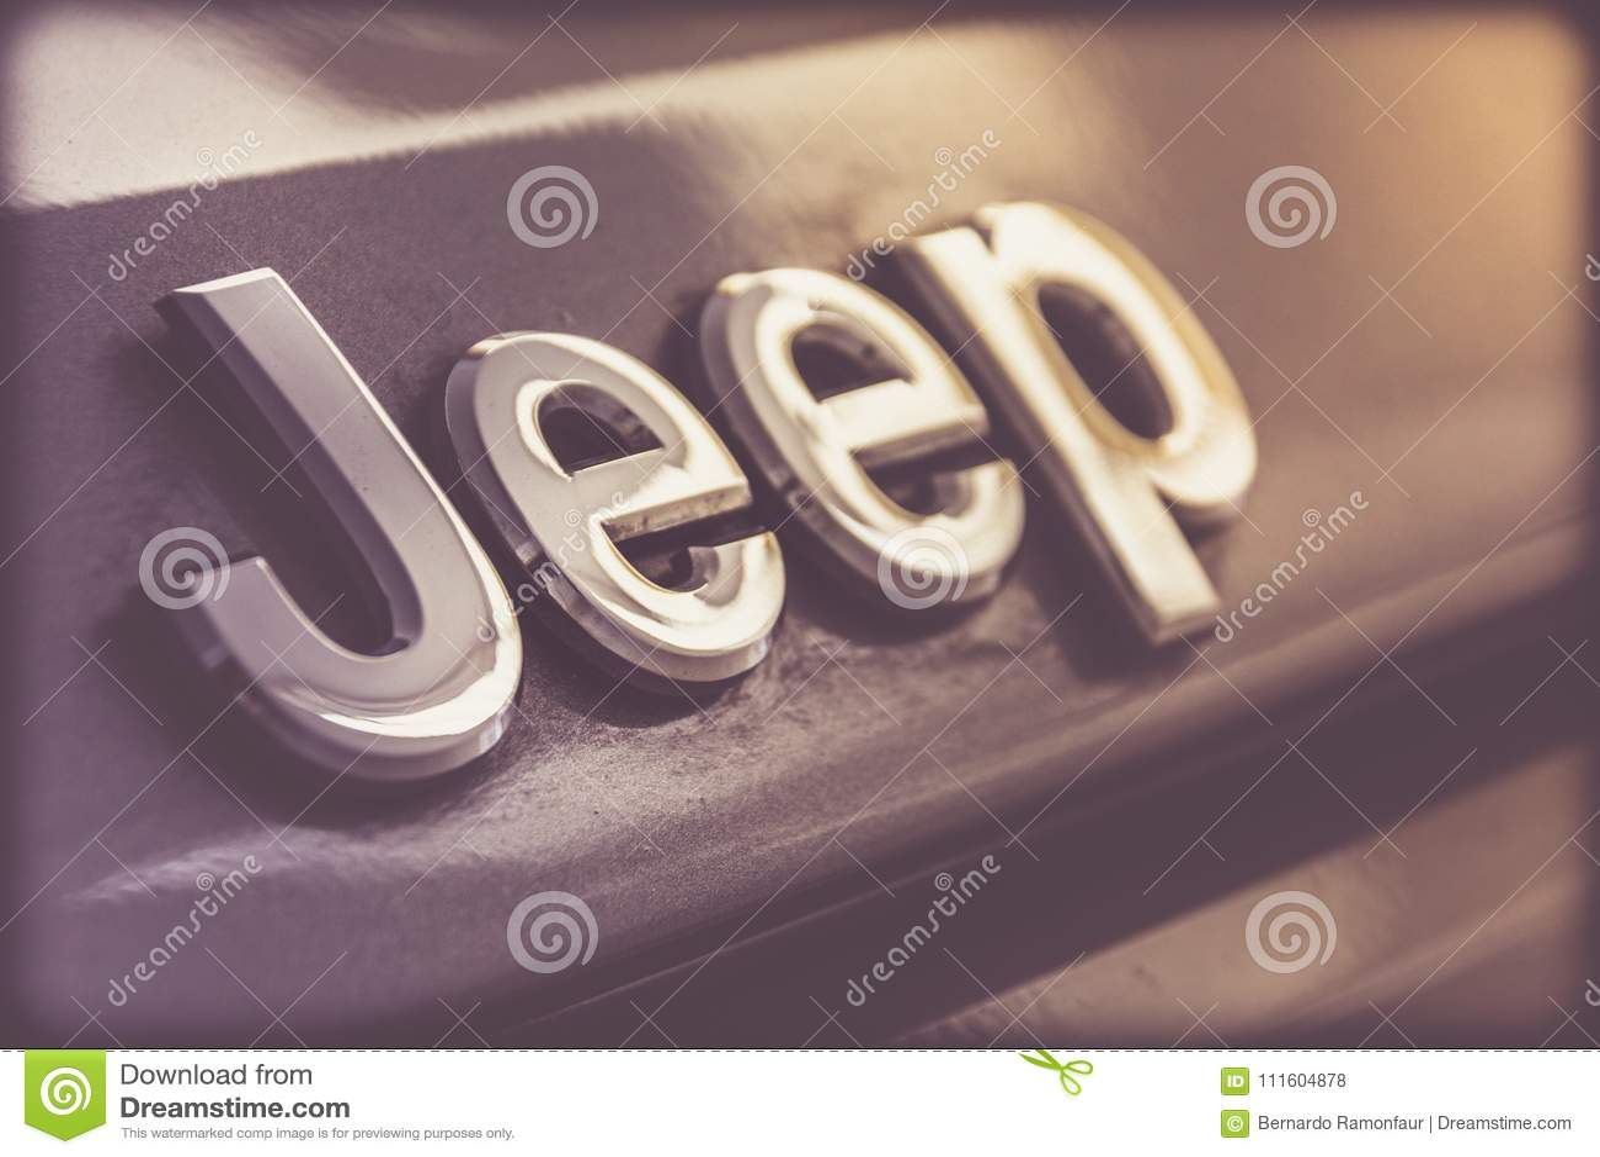 Emblema do metal do jipe